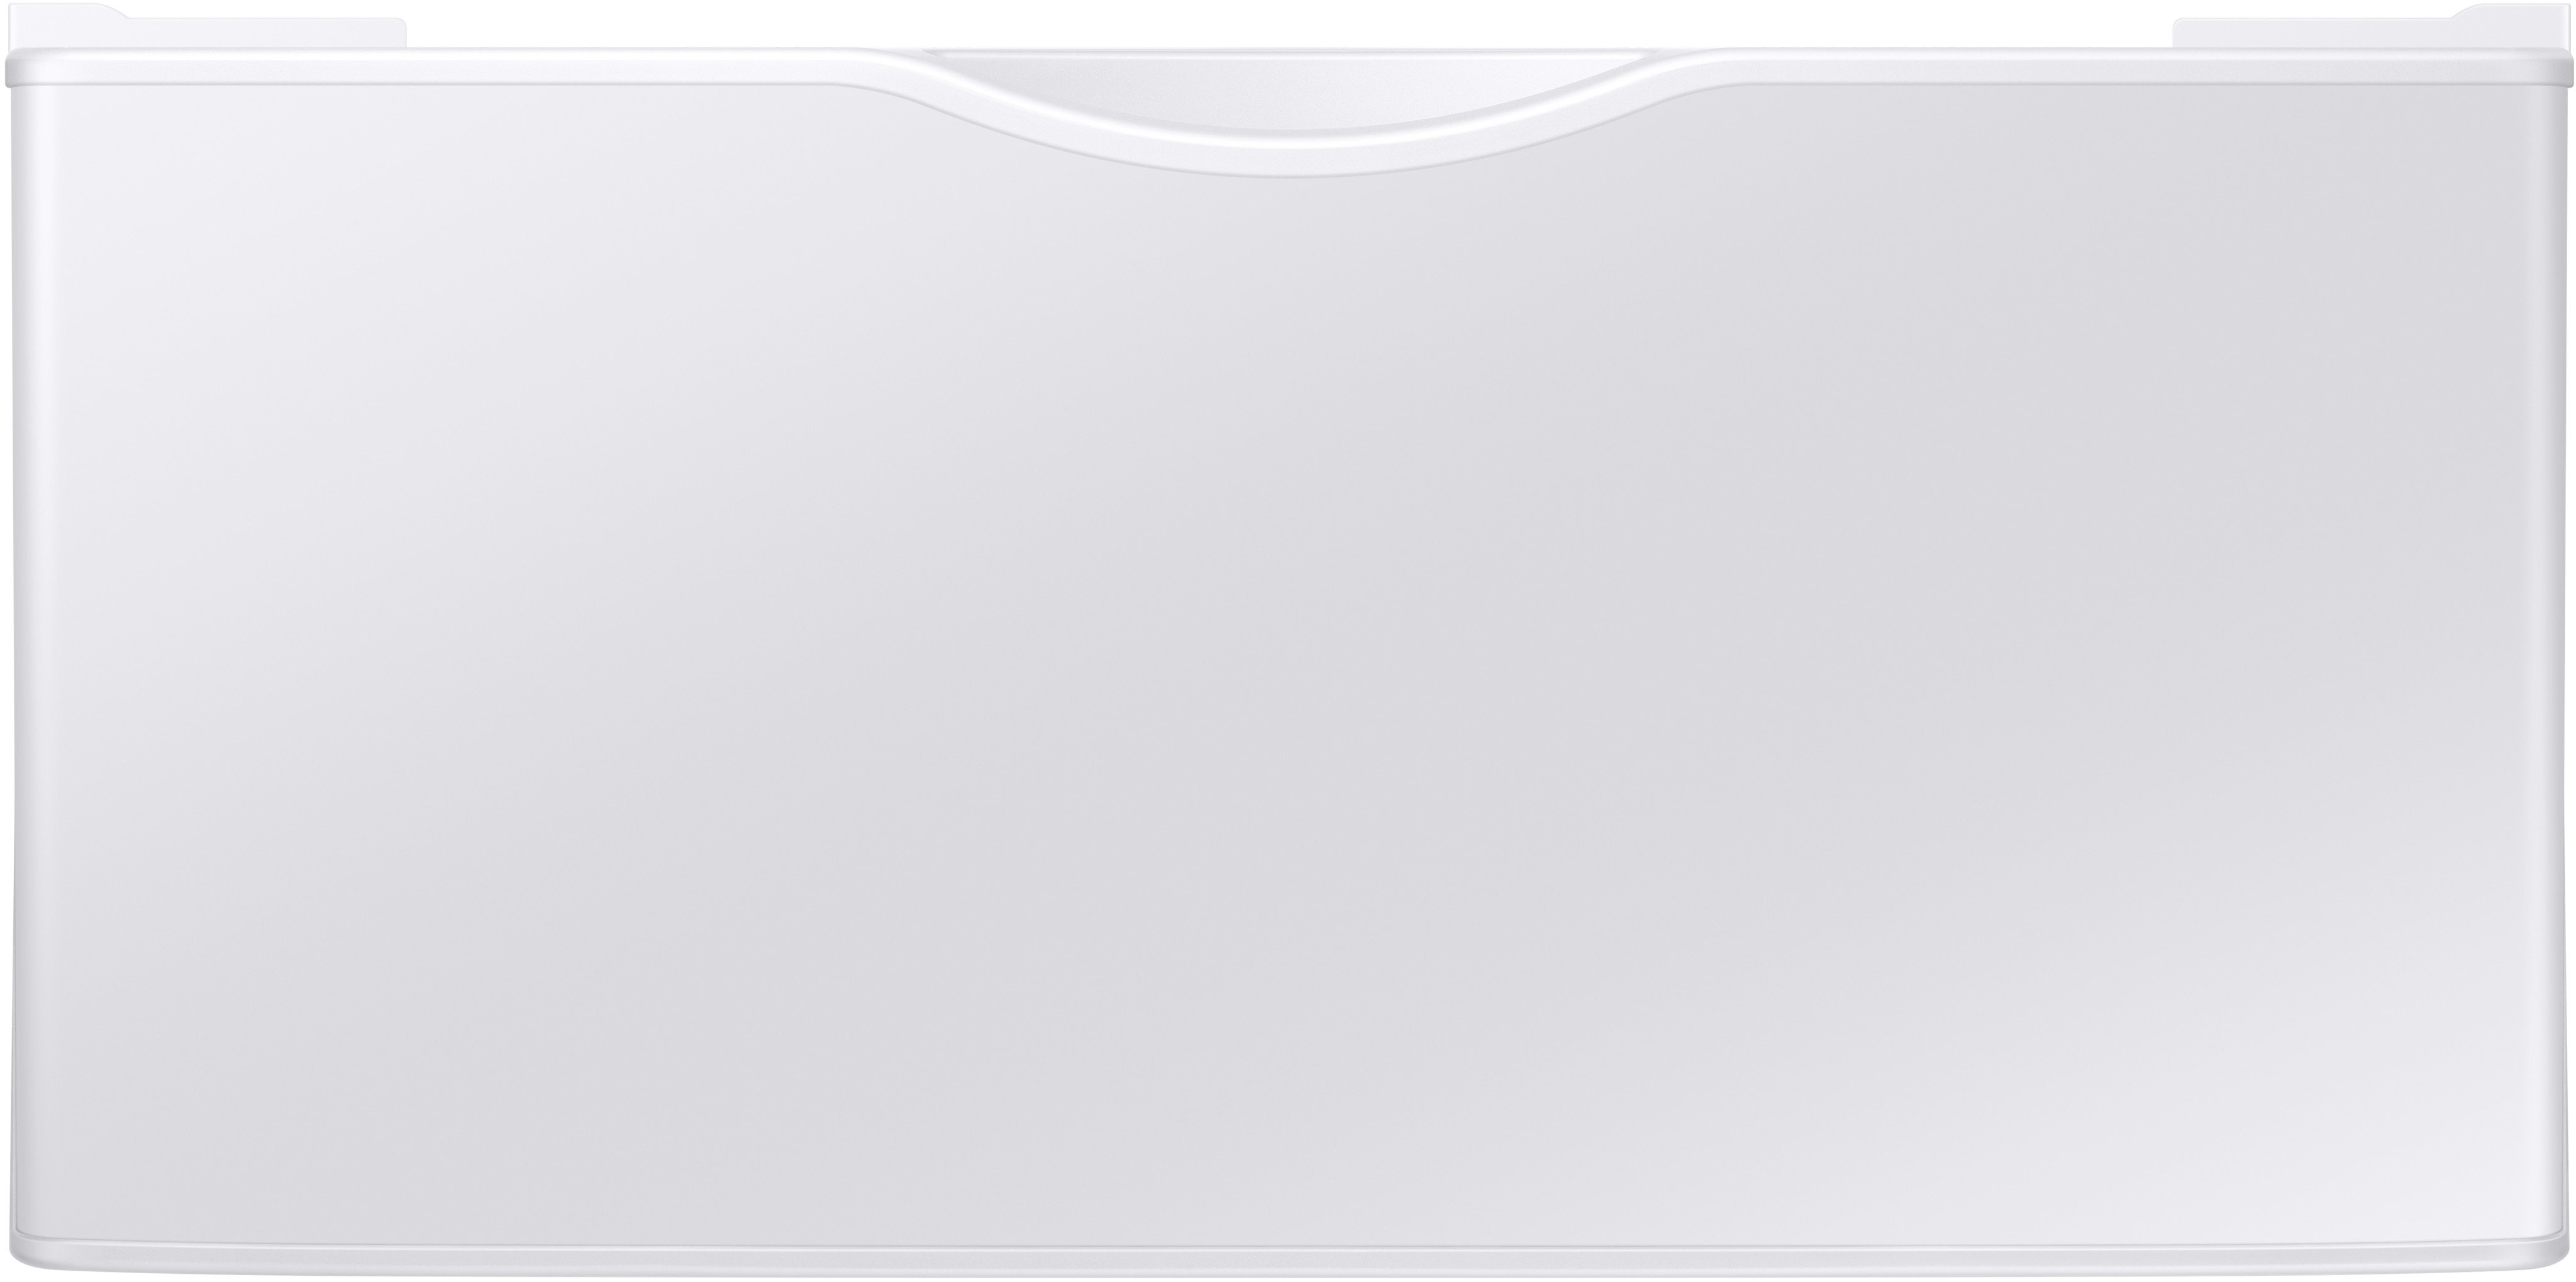 Samsung We402nw 27 Inch Pedestal For Smart Front Load